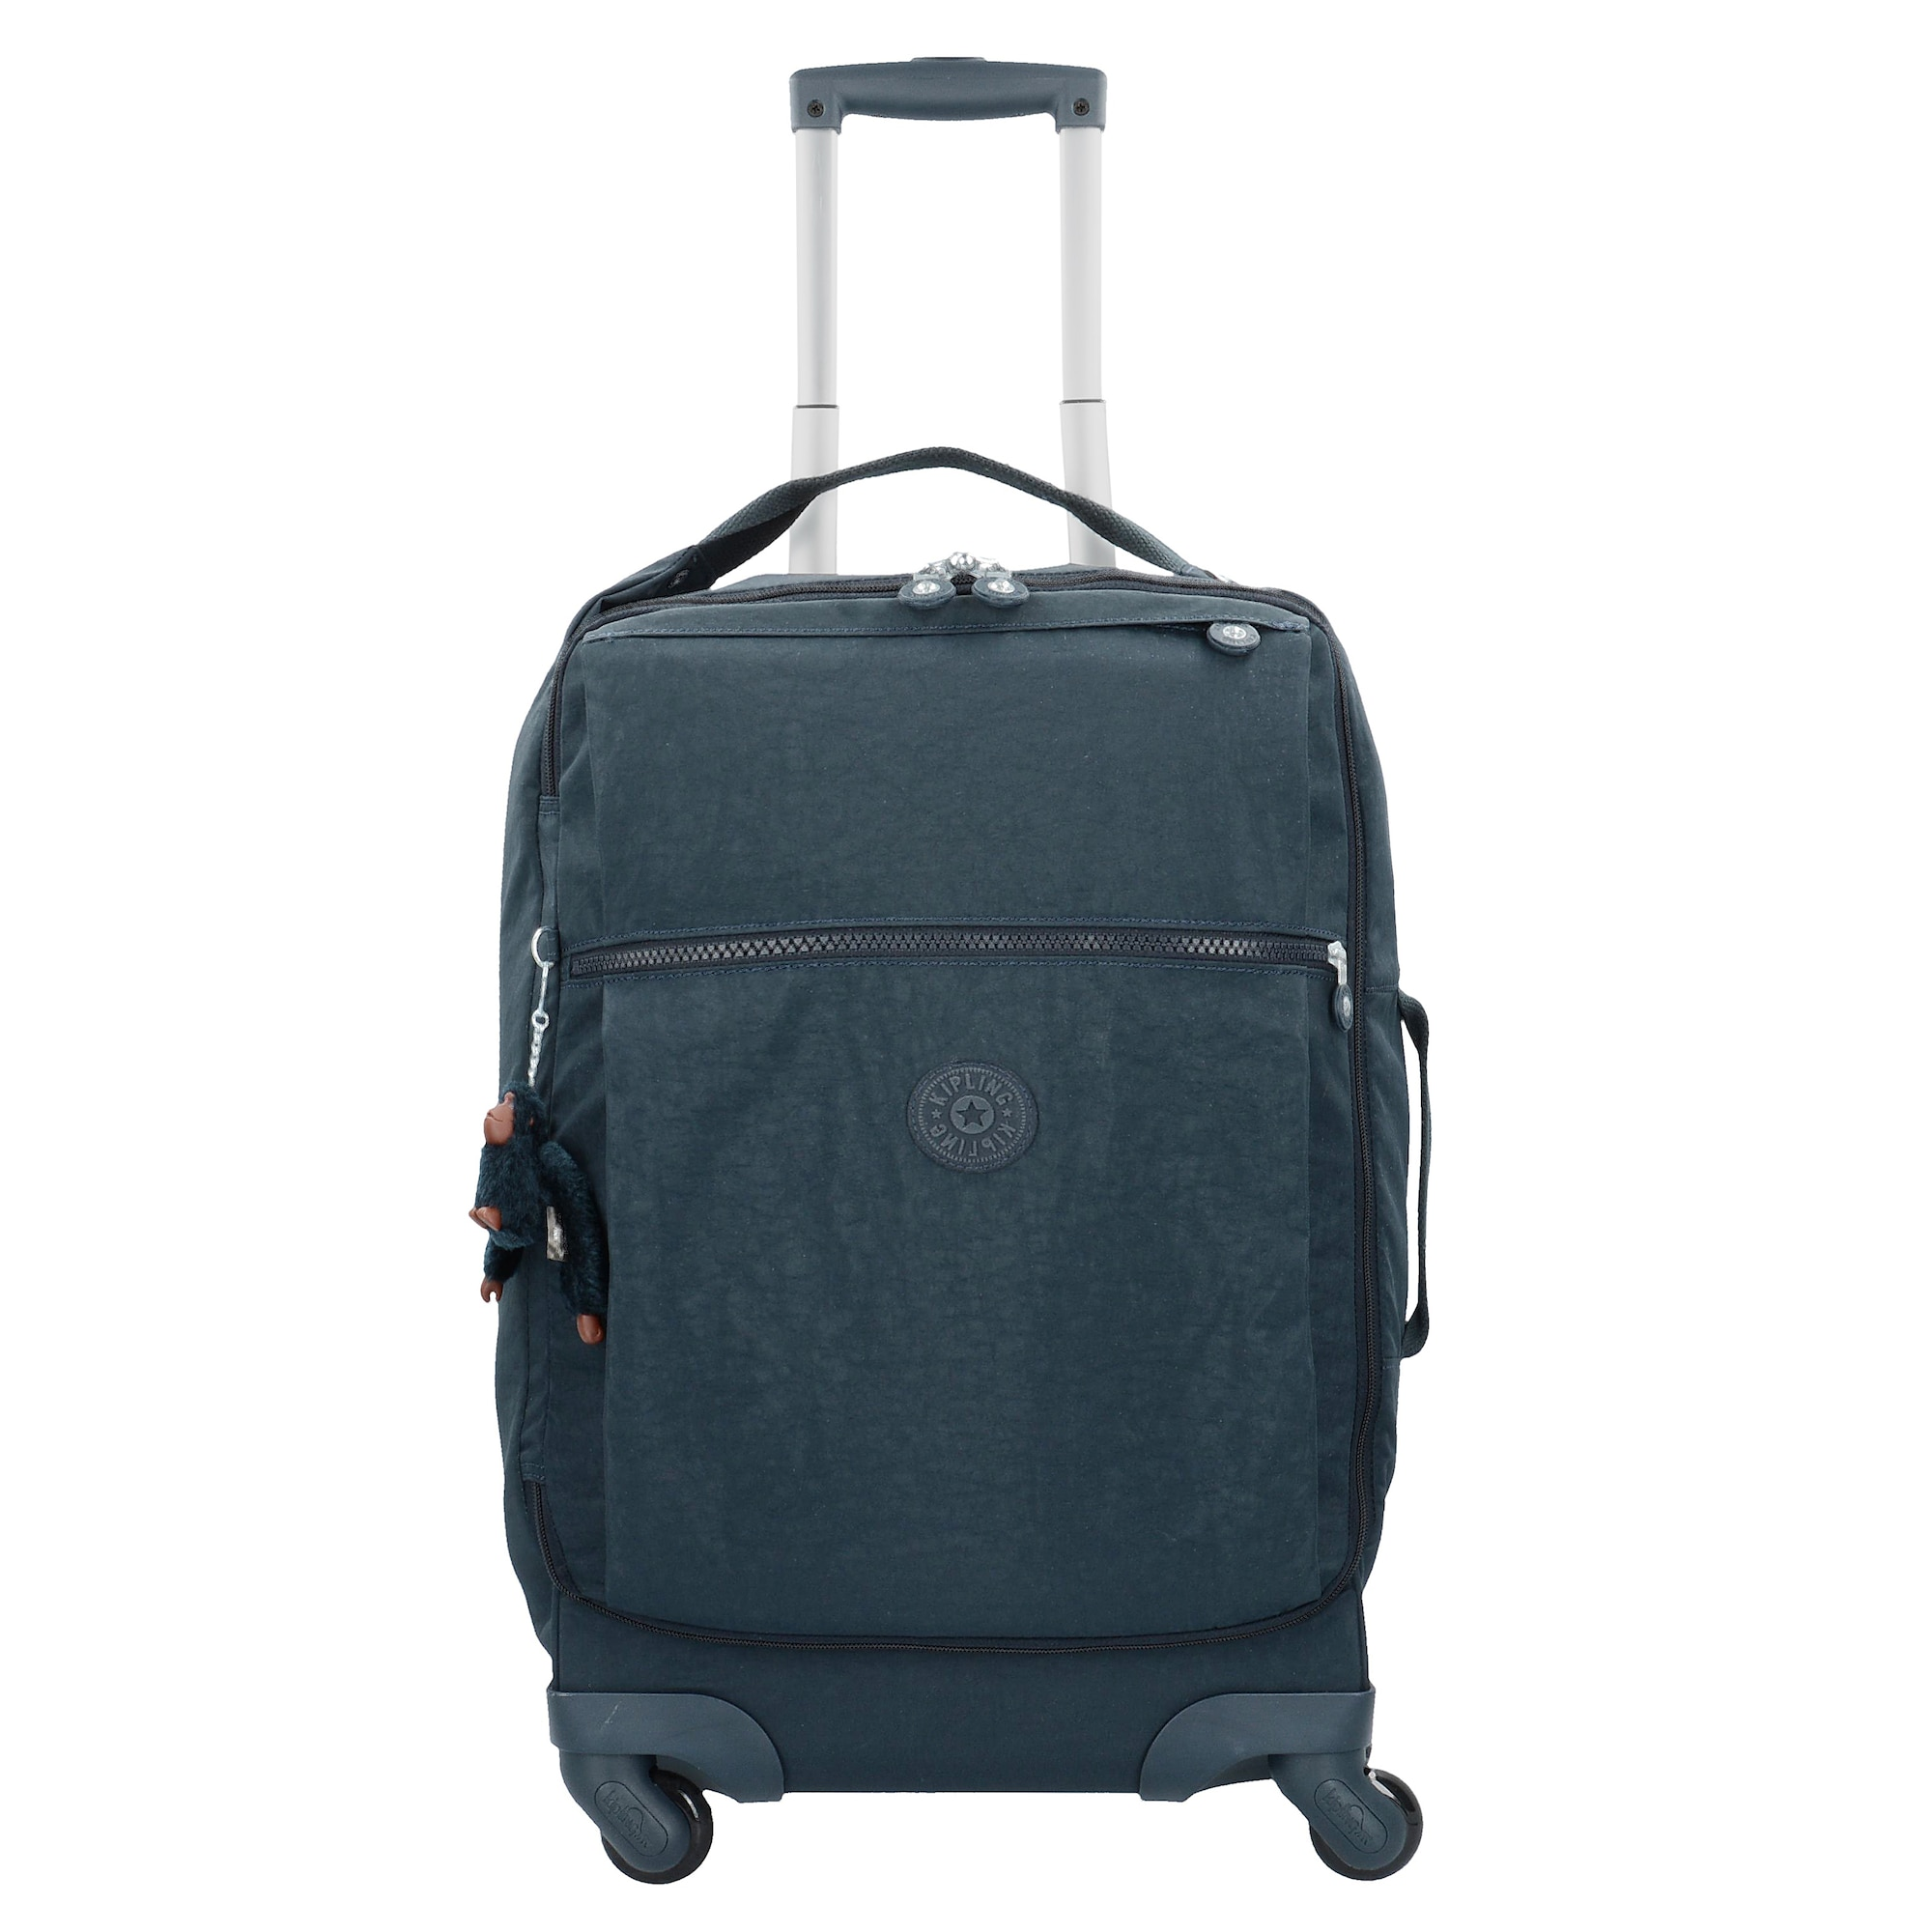 Trolley 'Darcey' | Taschen > Koffer & Trolleys > Trolleys | KIPLING